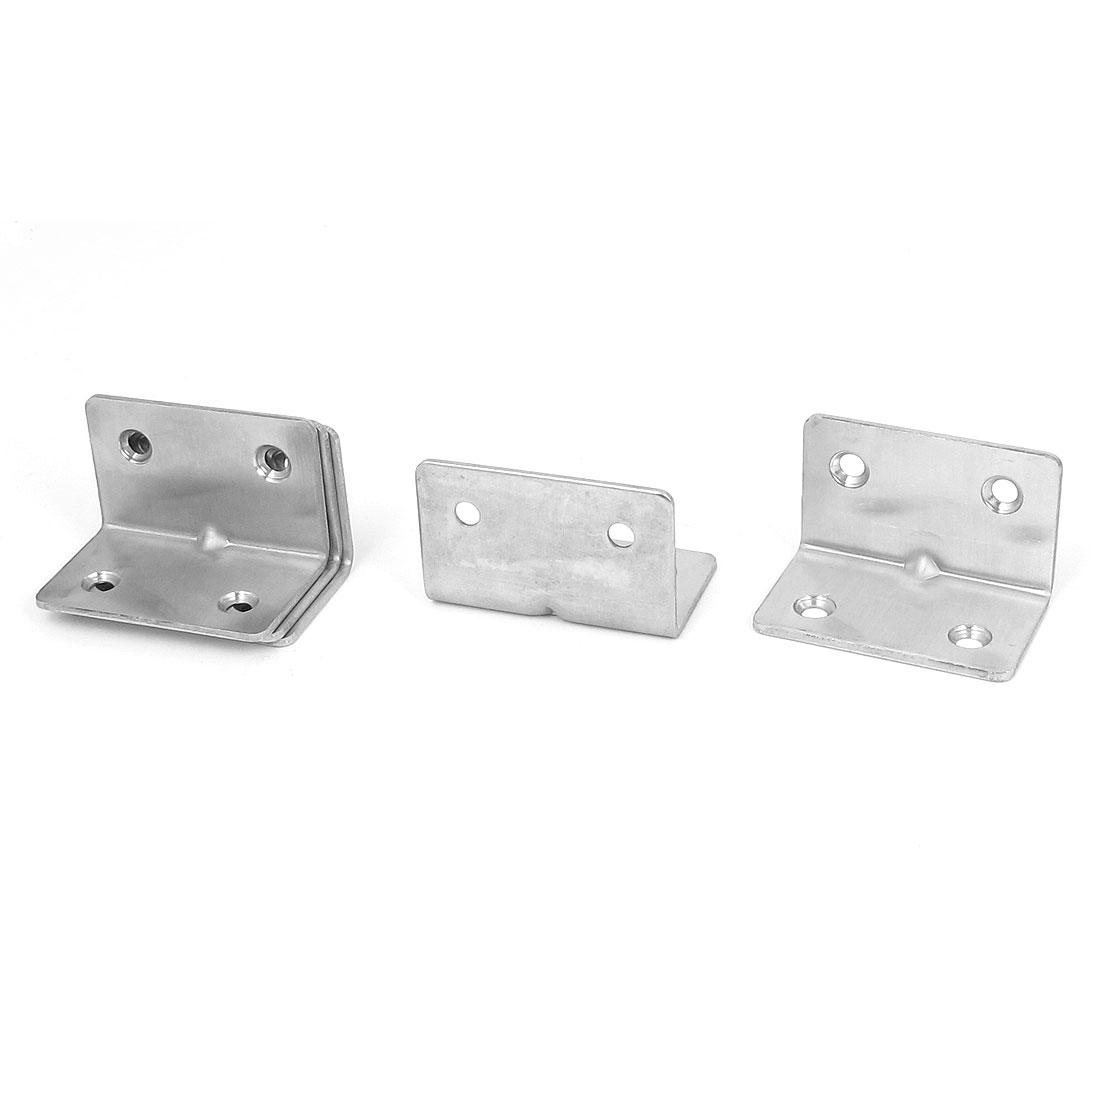 30mmx30mmx50mm L Shape Corner Brace Repair Right Angle Bracket Shelf Support 5pcs